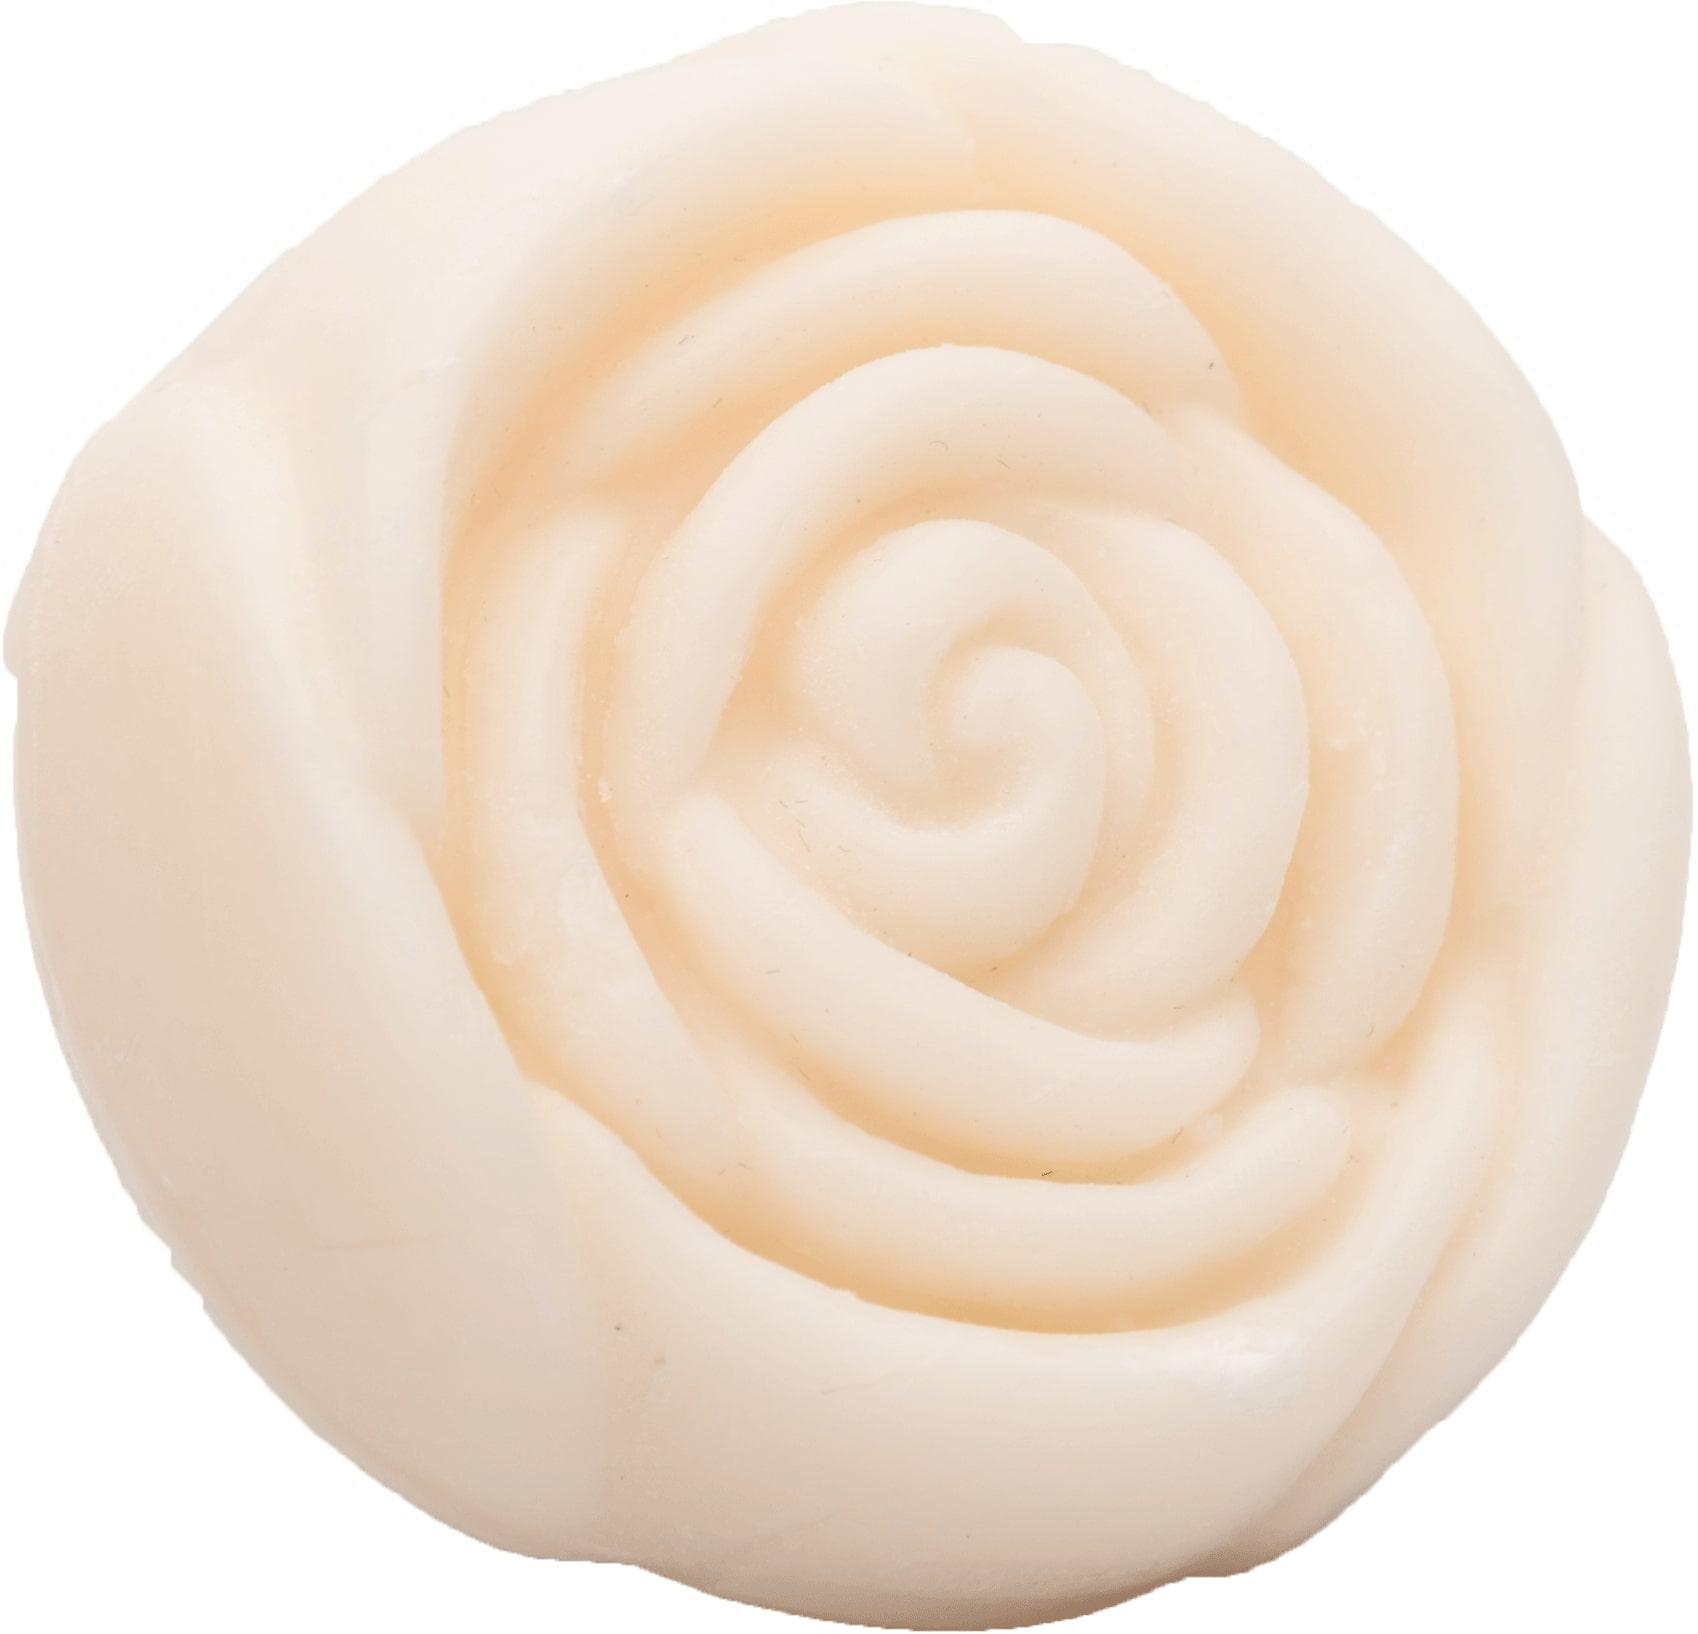 Seife in Rosenform 50g - Baumwollblüten